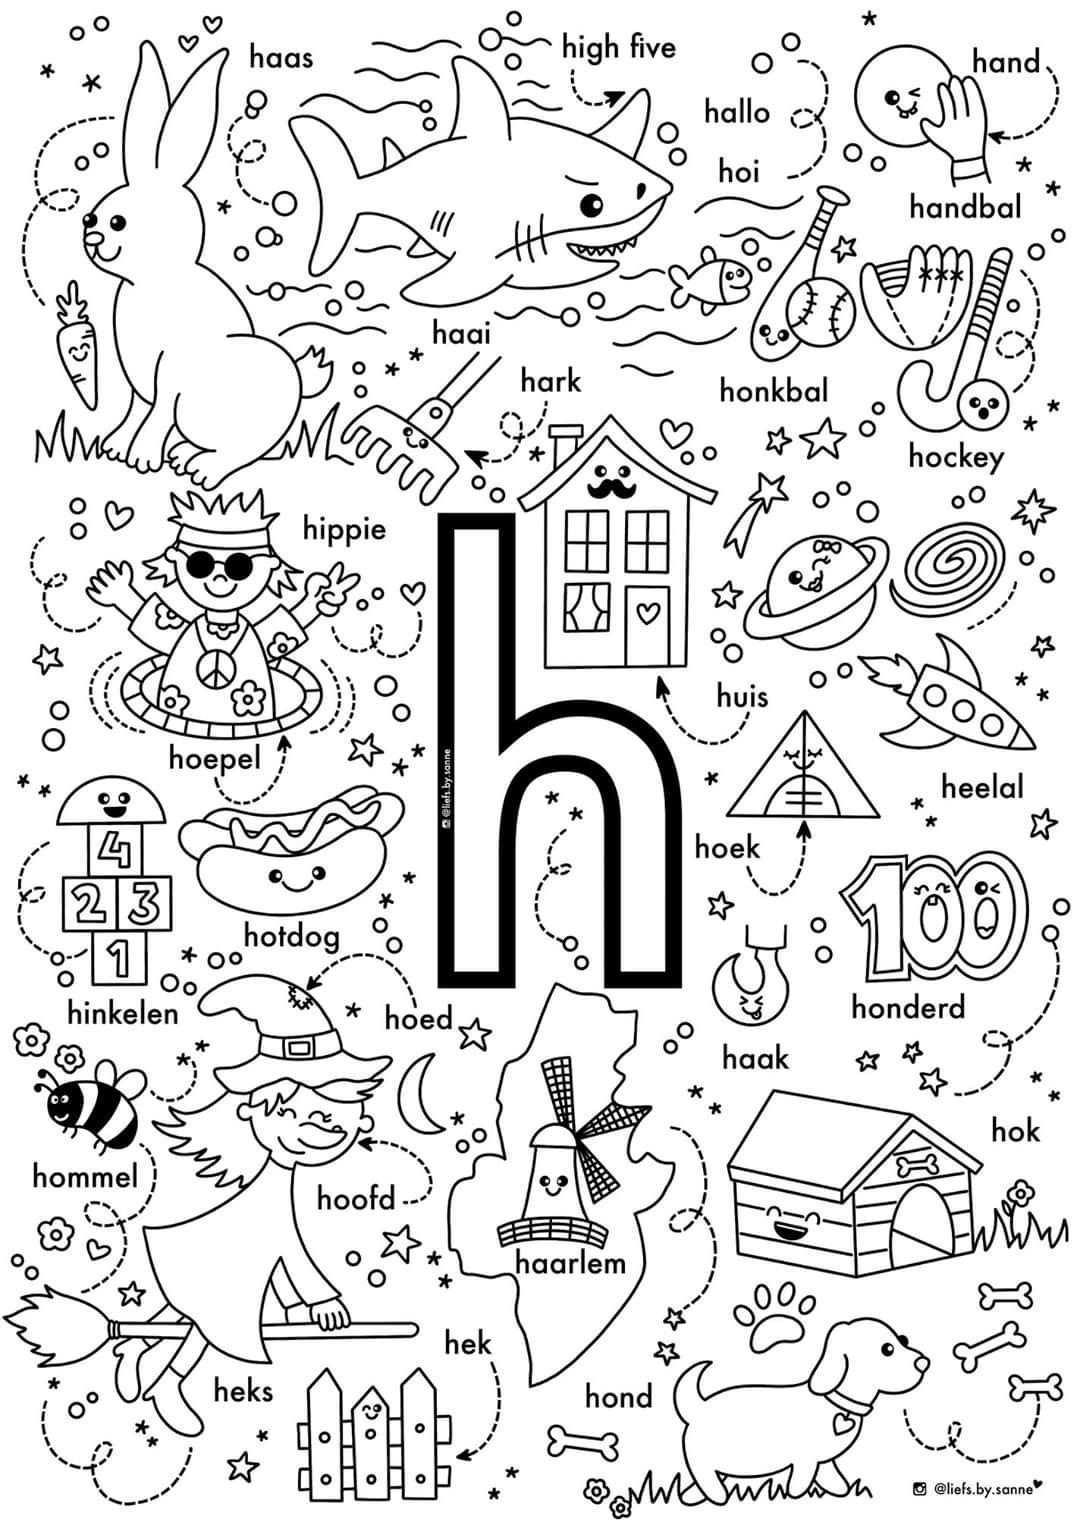 H Woorden Kleurplaat Letterherkenning Letterherkenning Spelletjes Alfabet Boek